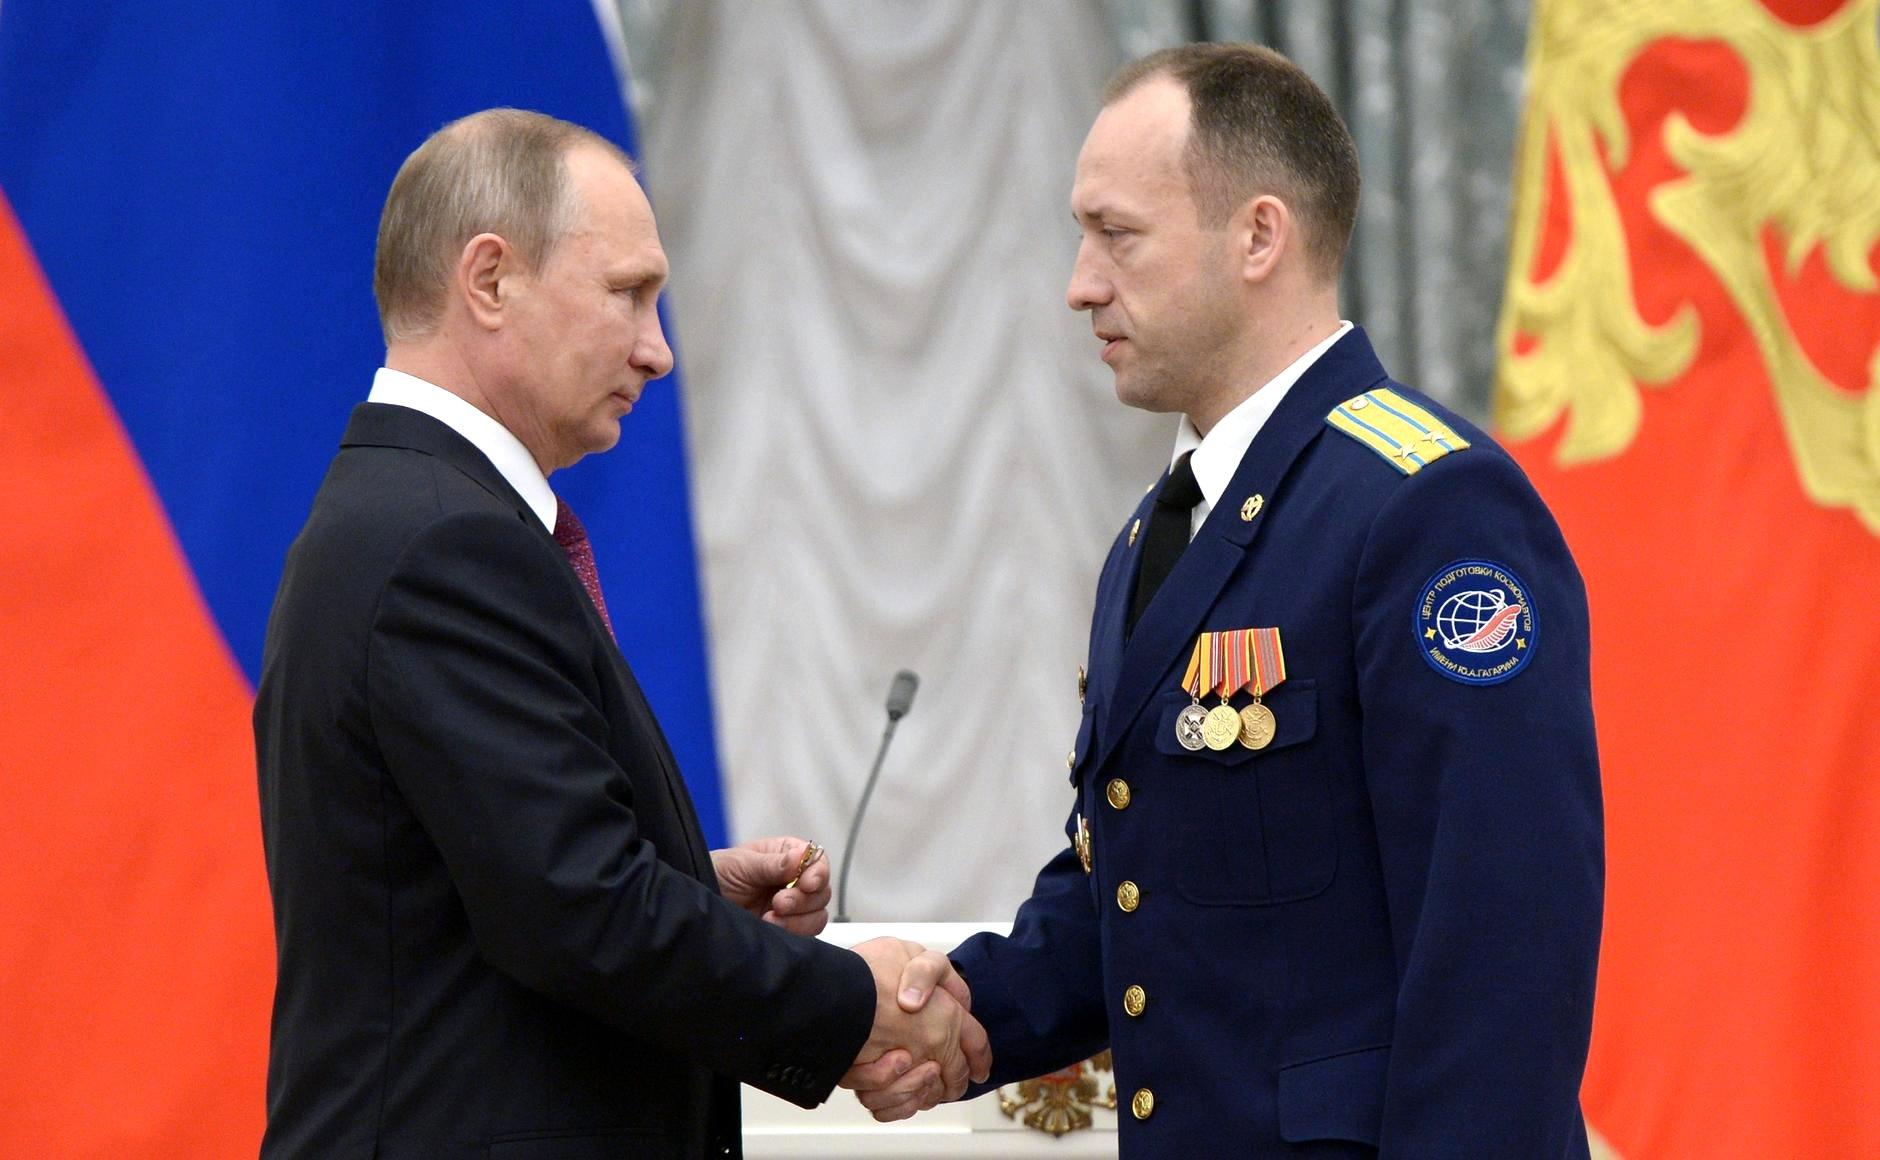 Vladimir Putin has awarded cosmonaut Alexander Misurkin.